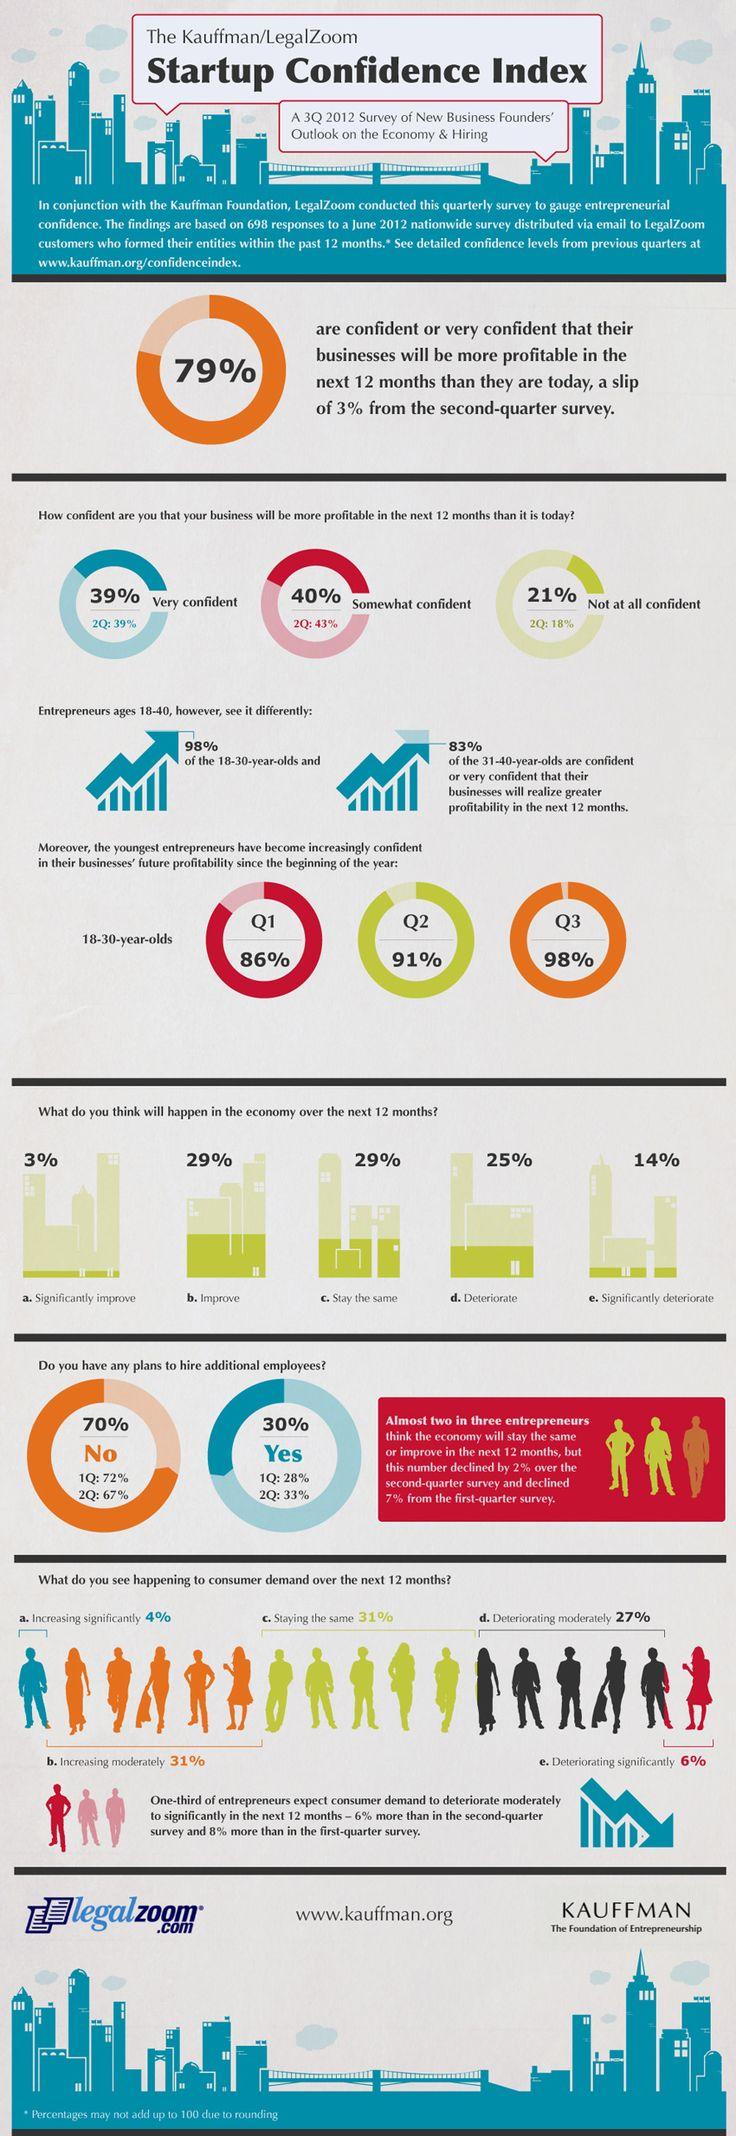 #Startup Confidence Index 3Q 2012: Entrepreneurs, Confidence Dips, Confidence Slipping, Economy, Economic Confidence, 2012 July, 3Q 2012, Kauffman Legalzoom Startup, Startup Confidence